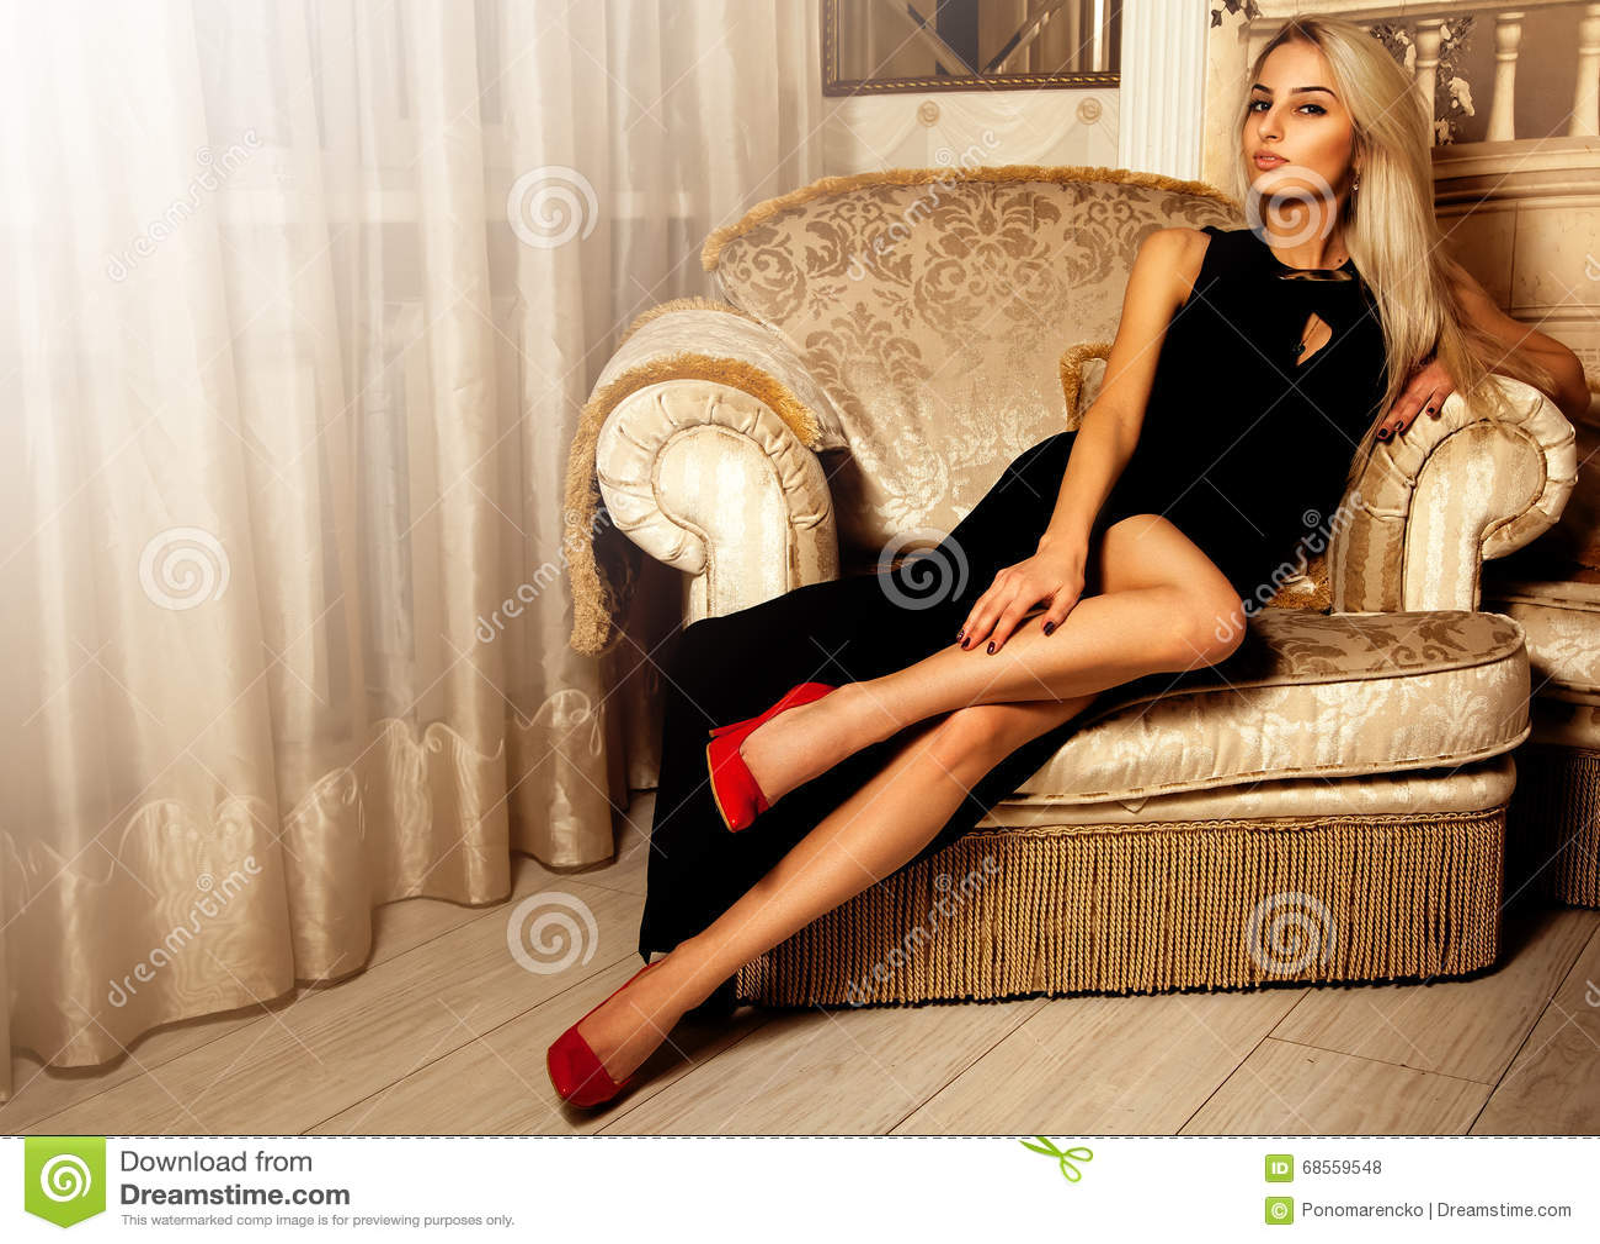 Academia Dominicana De La Lengua  Hot Blonde With High Heels On-7687